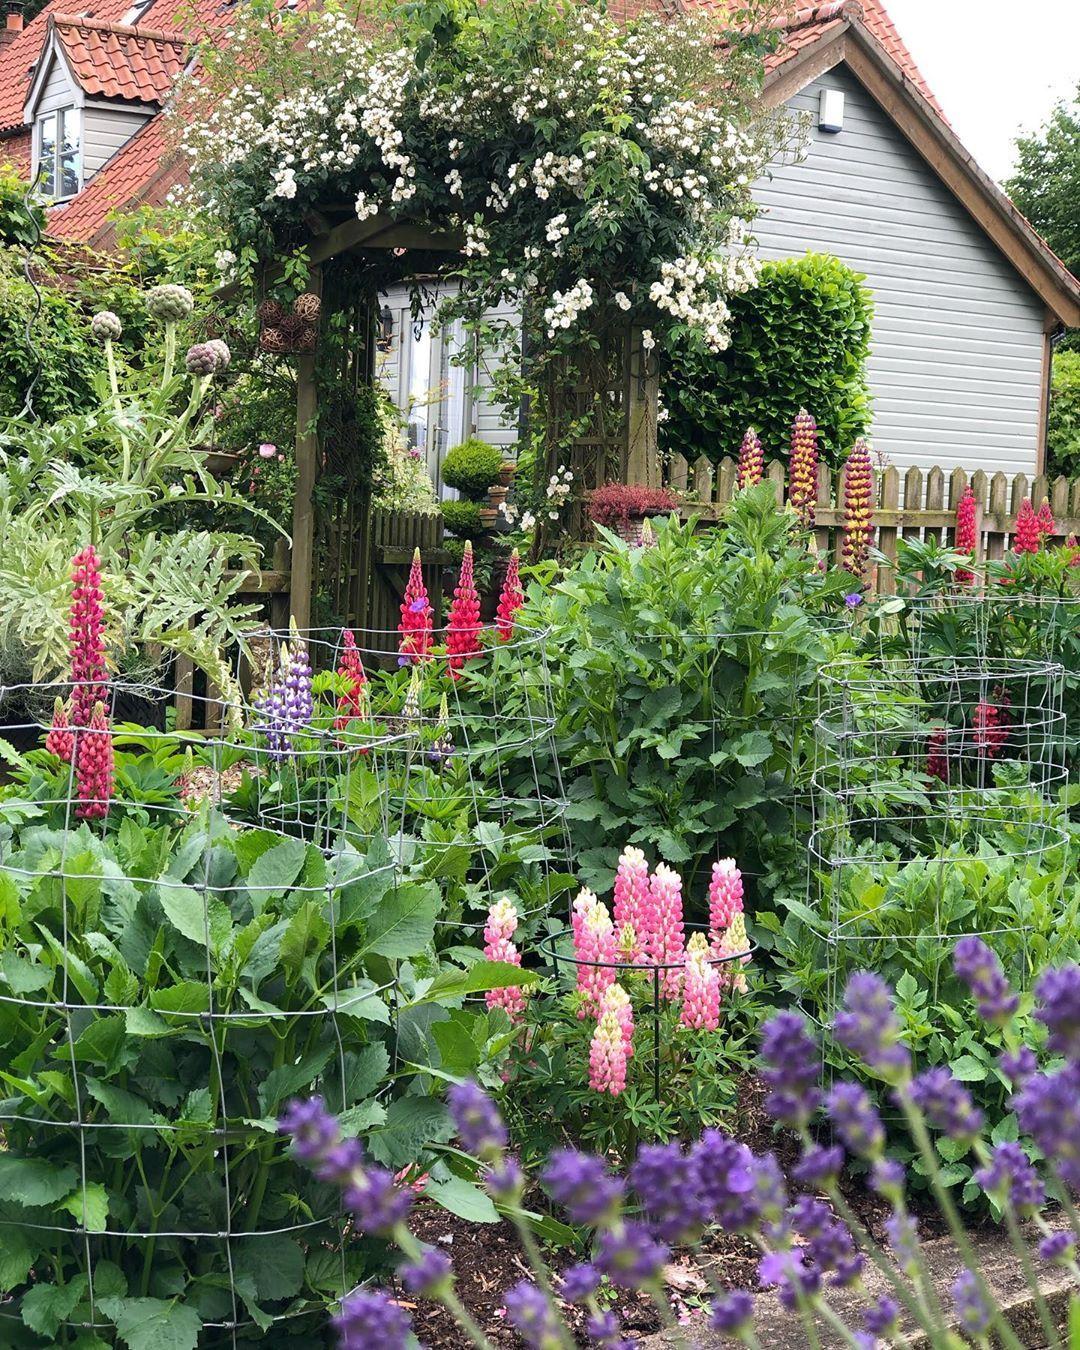 "Mo on Instagram: ""Lupin love ... 😍 . . . . . . . #lupin #homesandgardens #houseandgarden #countrygarden #gardenalia #instagarden #lovemygarden #gardener…"""